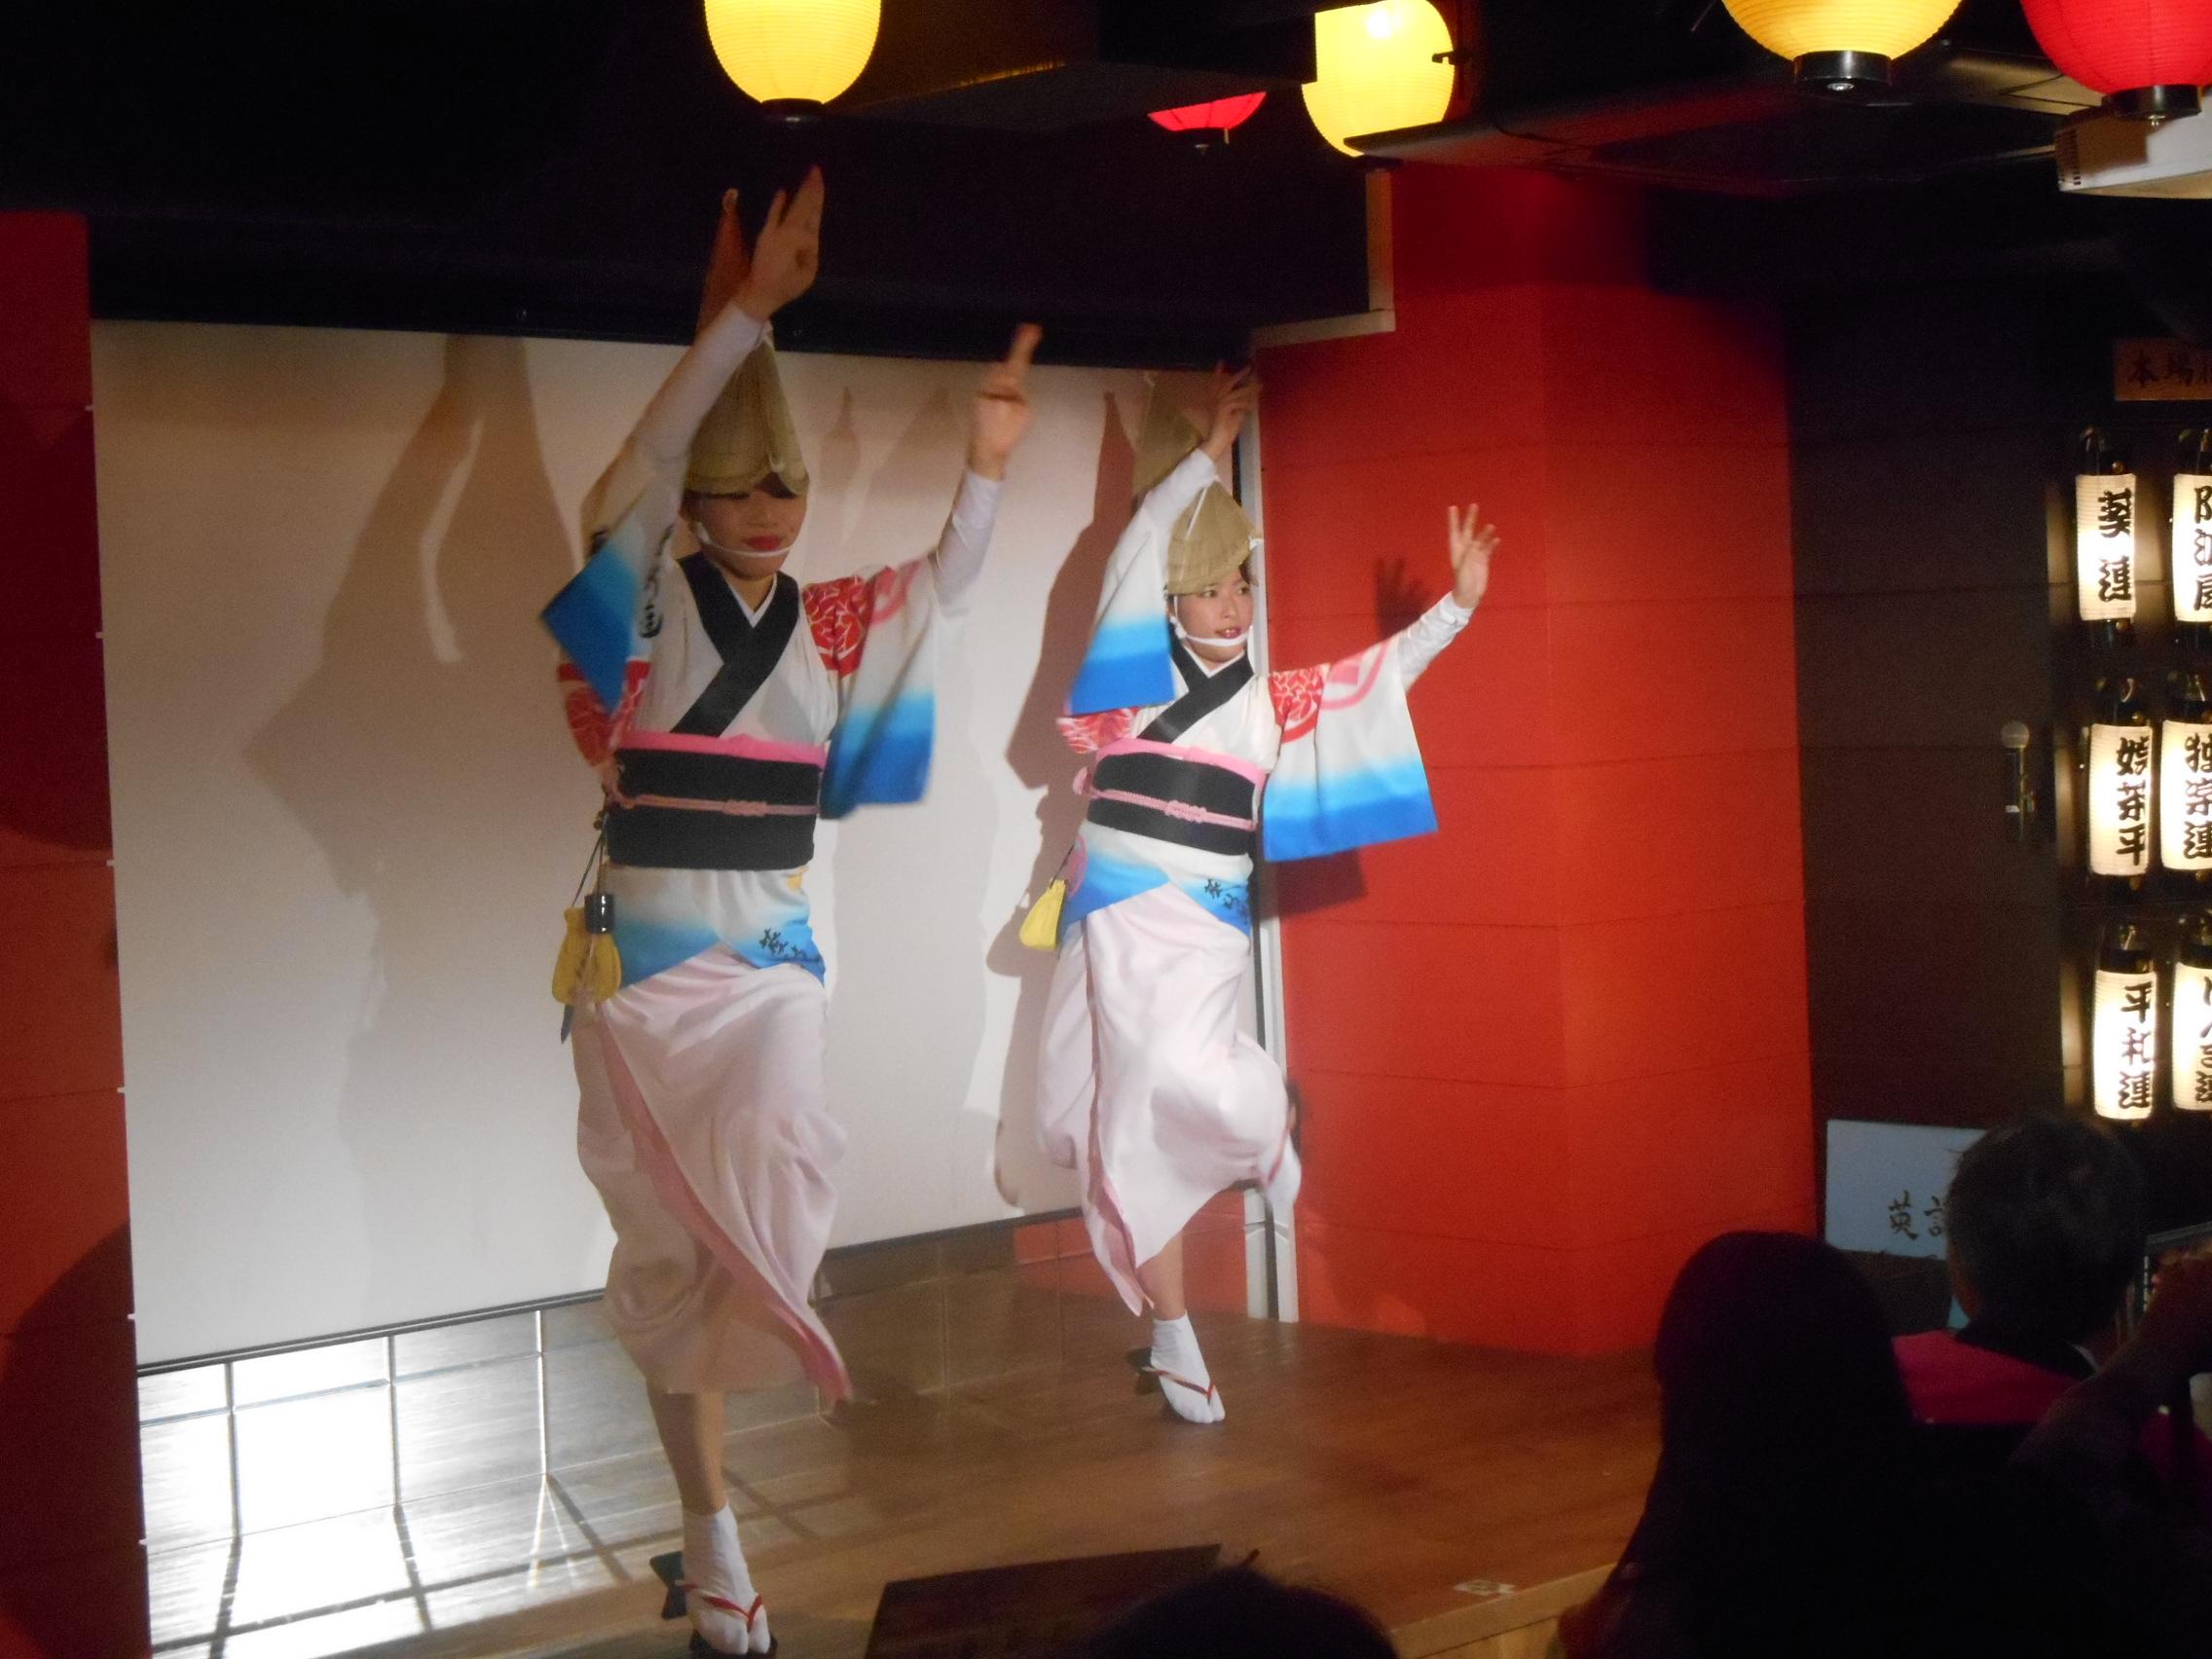 DSCN2115 - 2017年2月4日東京思風塾開催